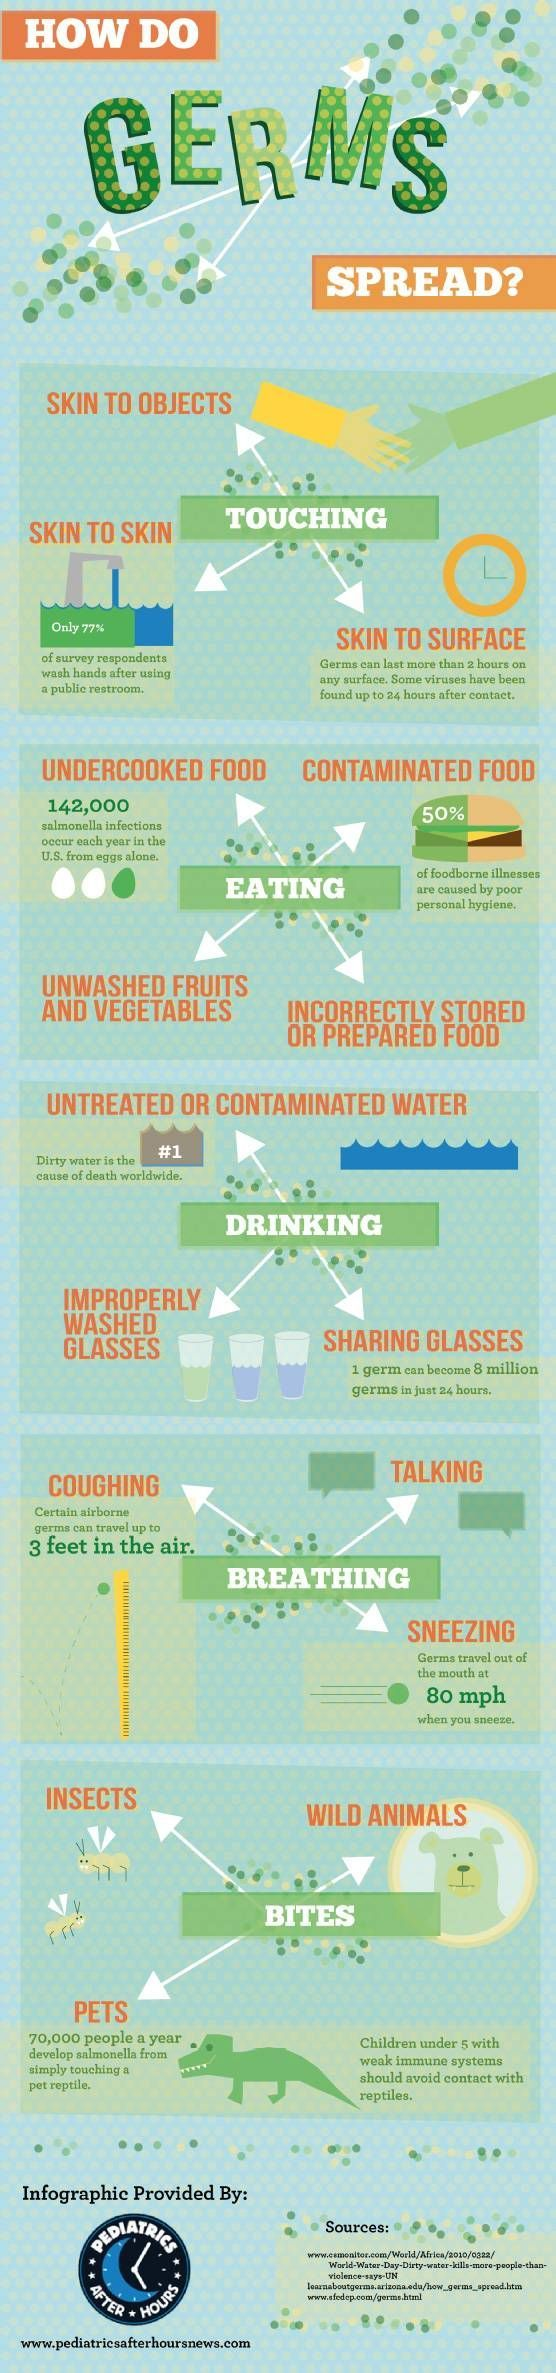 How do germs spread